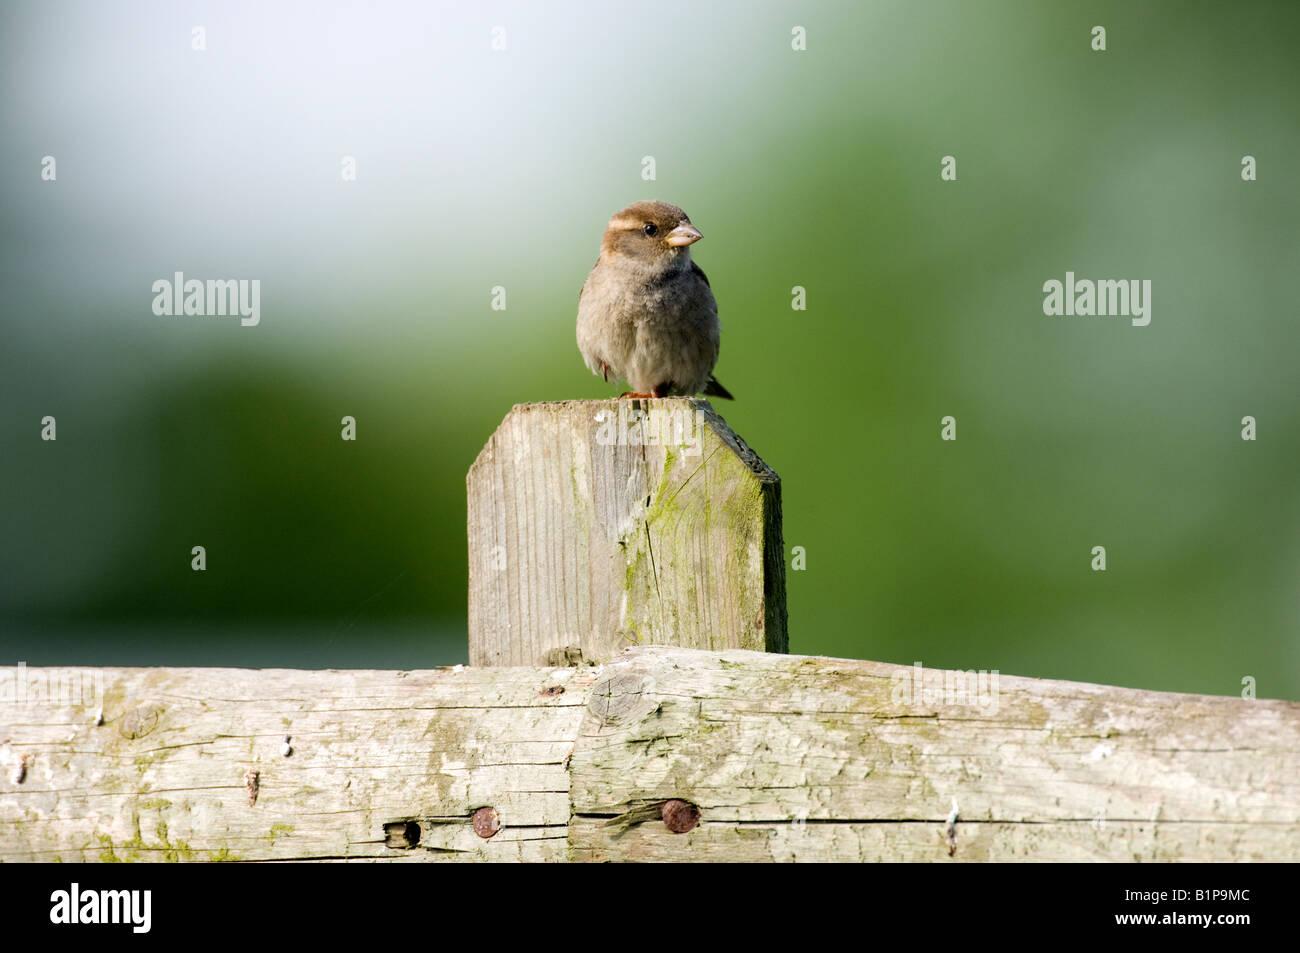 Female house sparrow (Passer domesticus) - Stock Image